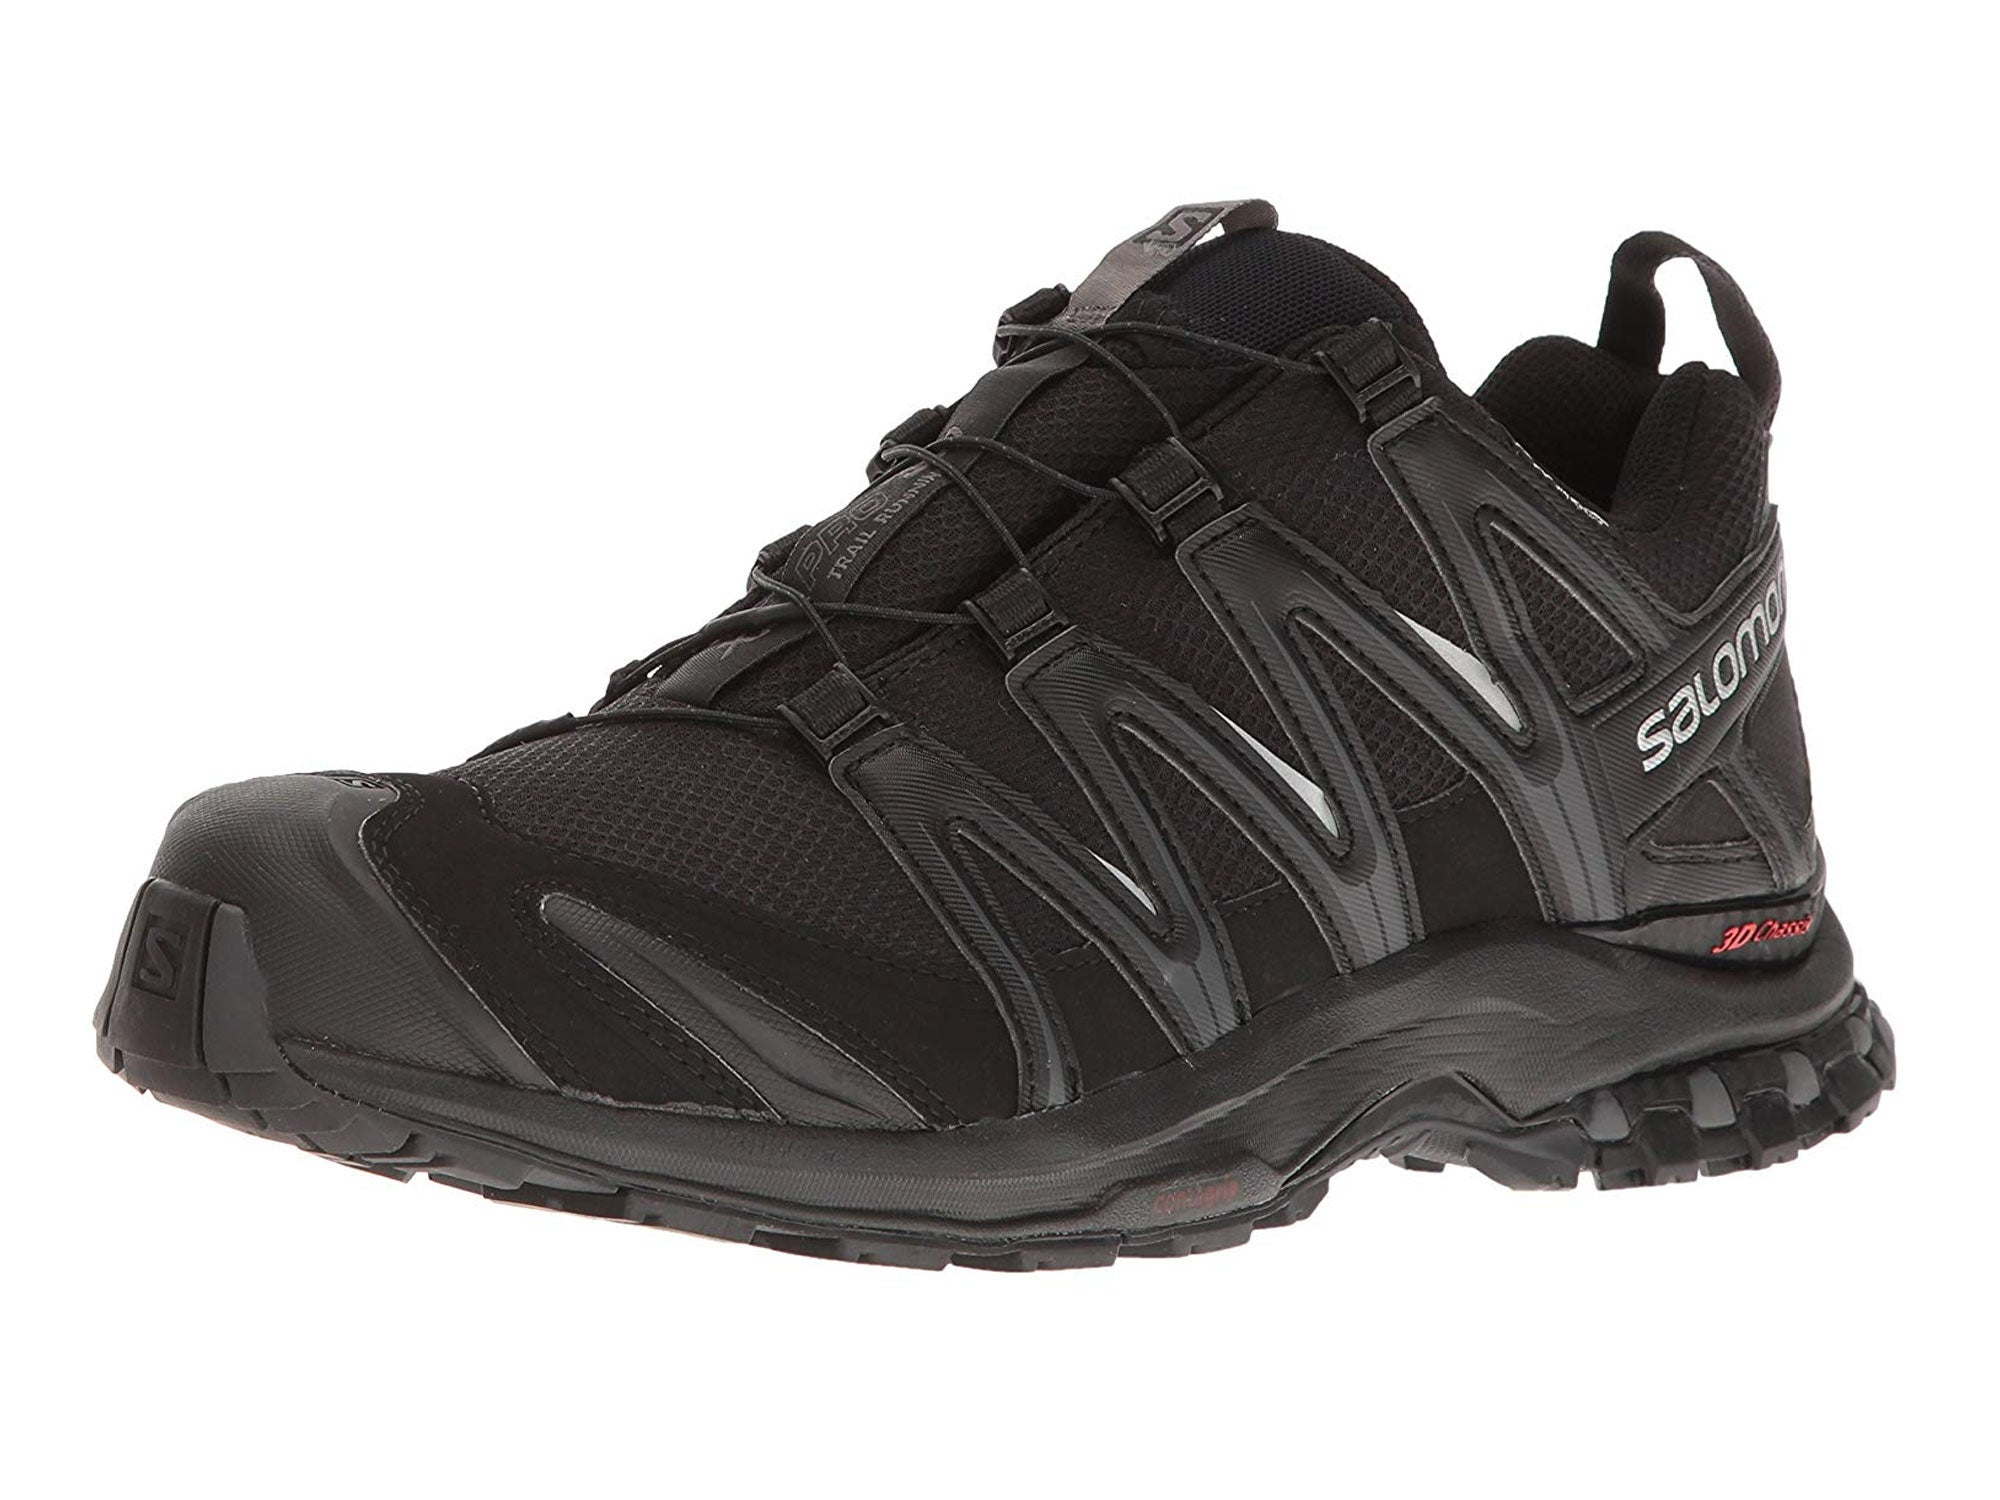 SALOMON Men's Xa Pro 3D Cs Wp Trail Running Shoes